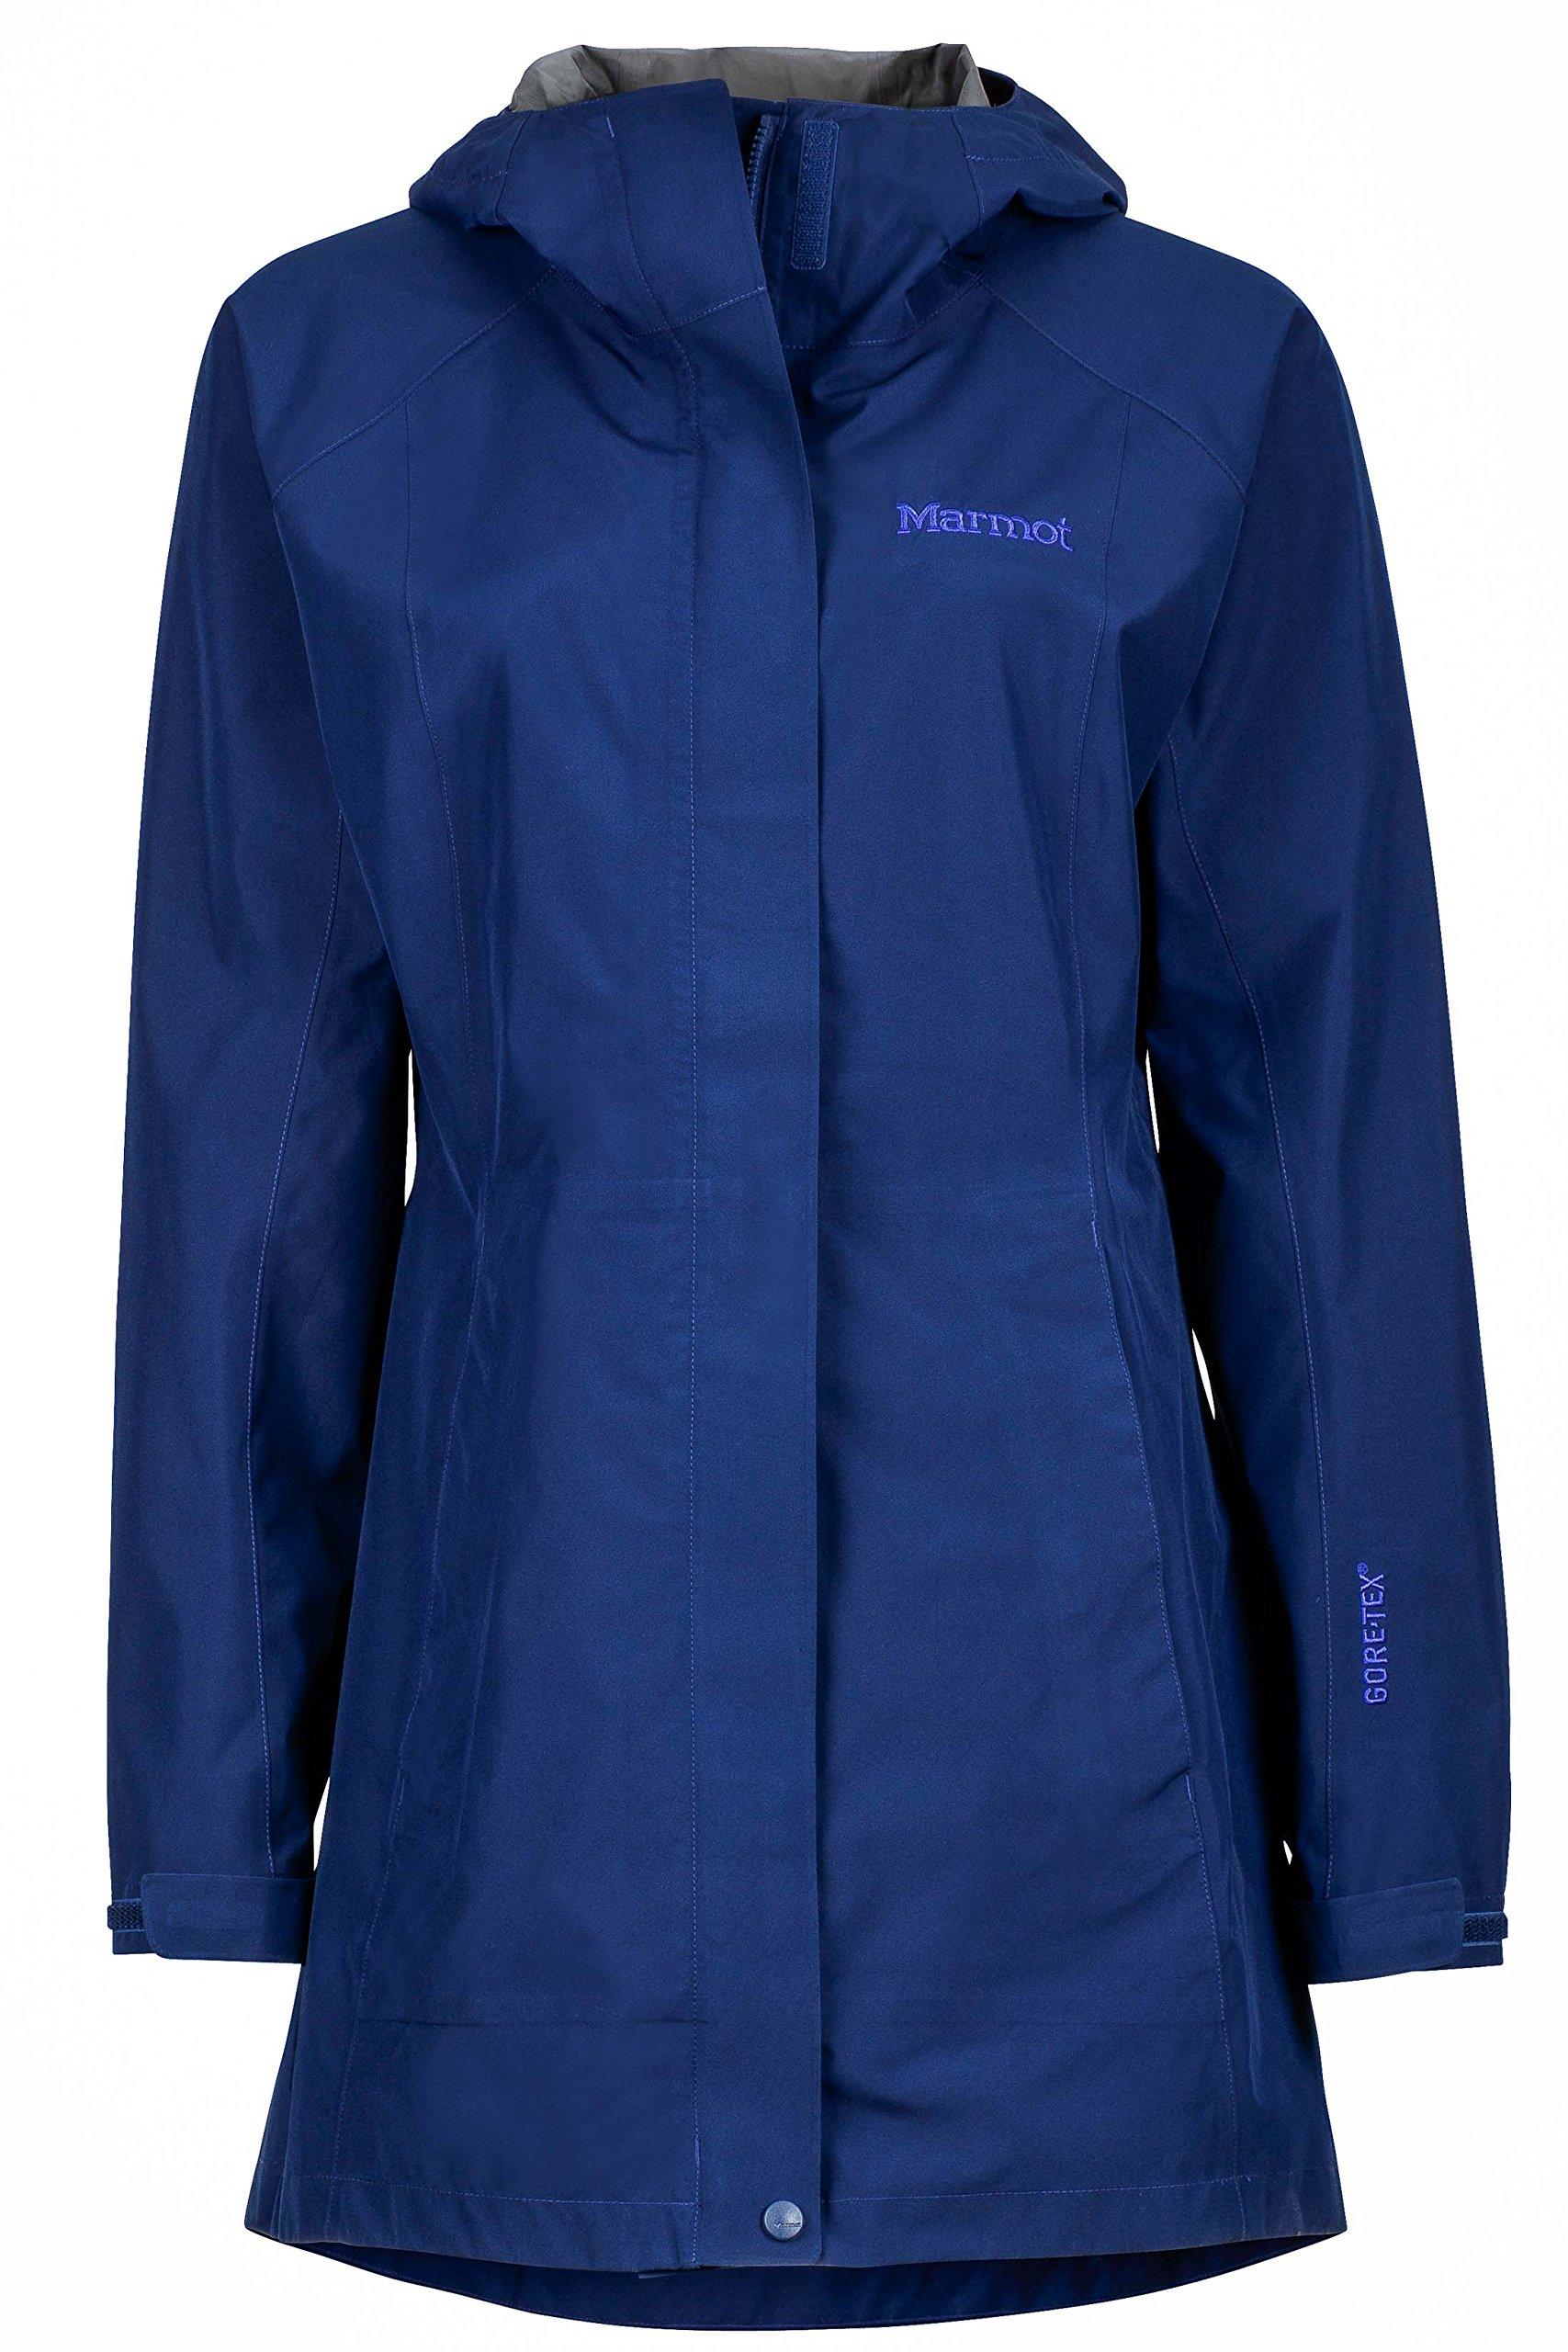 Marmot Women's Essential Lightweight Waterproof Rain Jacket GORE-TEX with PACLITE Technology